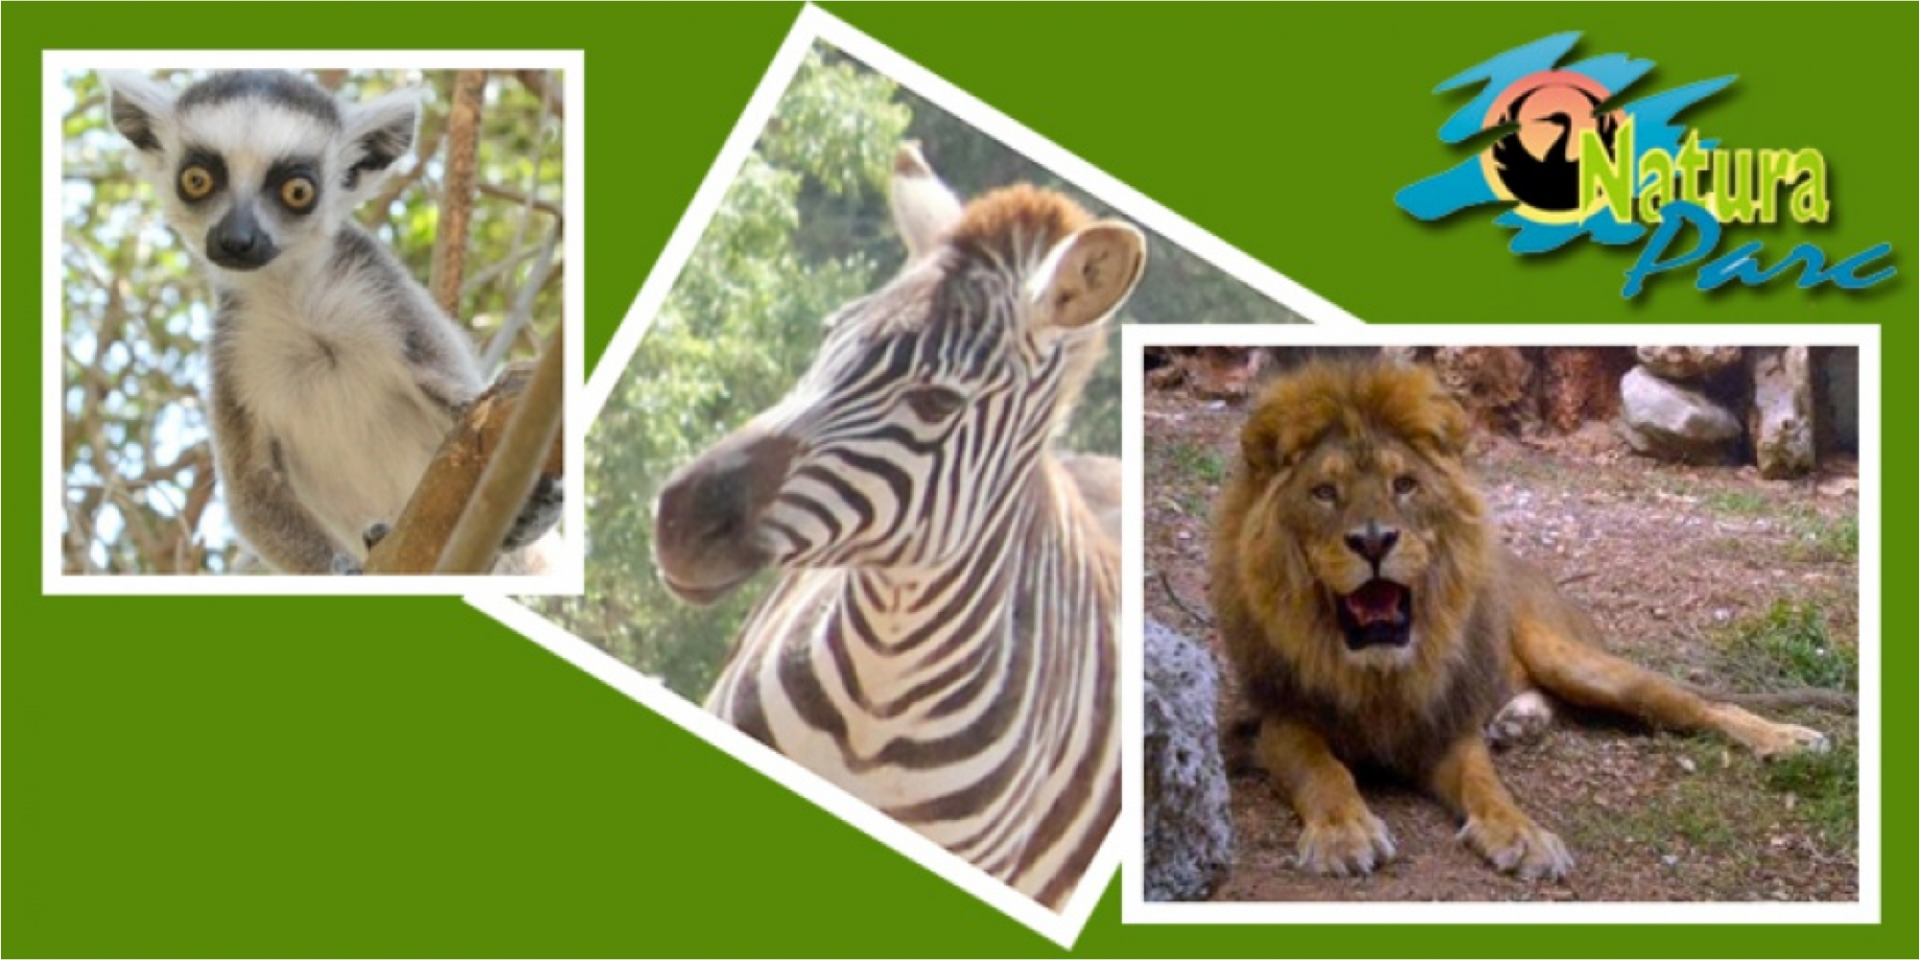 Zoo, Natura Parc, Sant Eugenia, Utflykt, barnaktivitet, Utomhusaktivitet